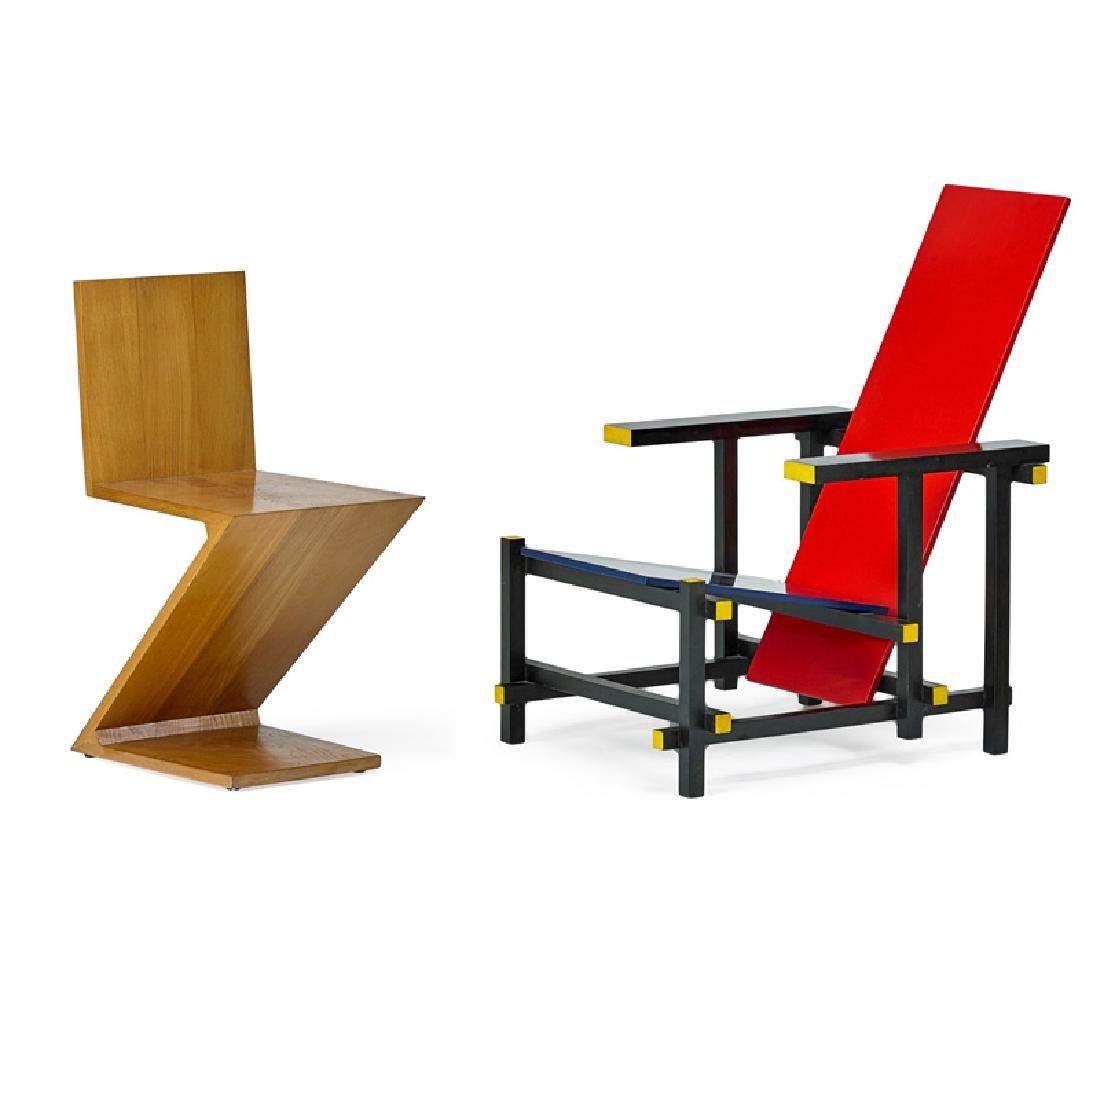 GERRIT RIETVELD; CASSINA Two chairs